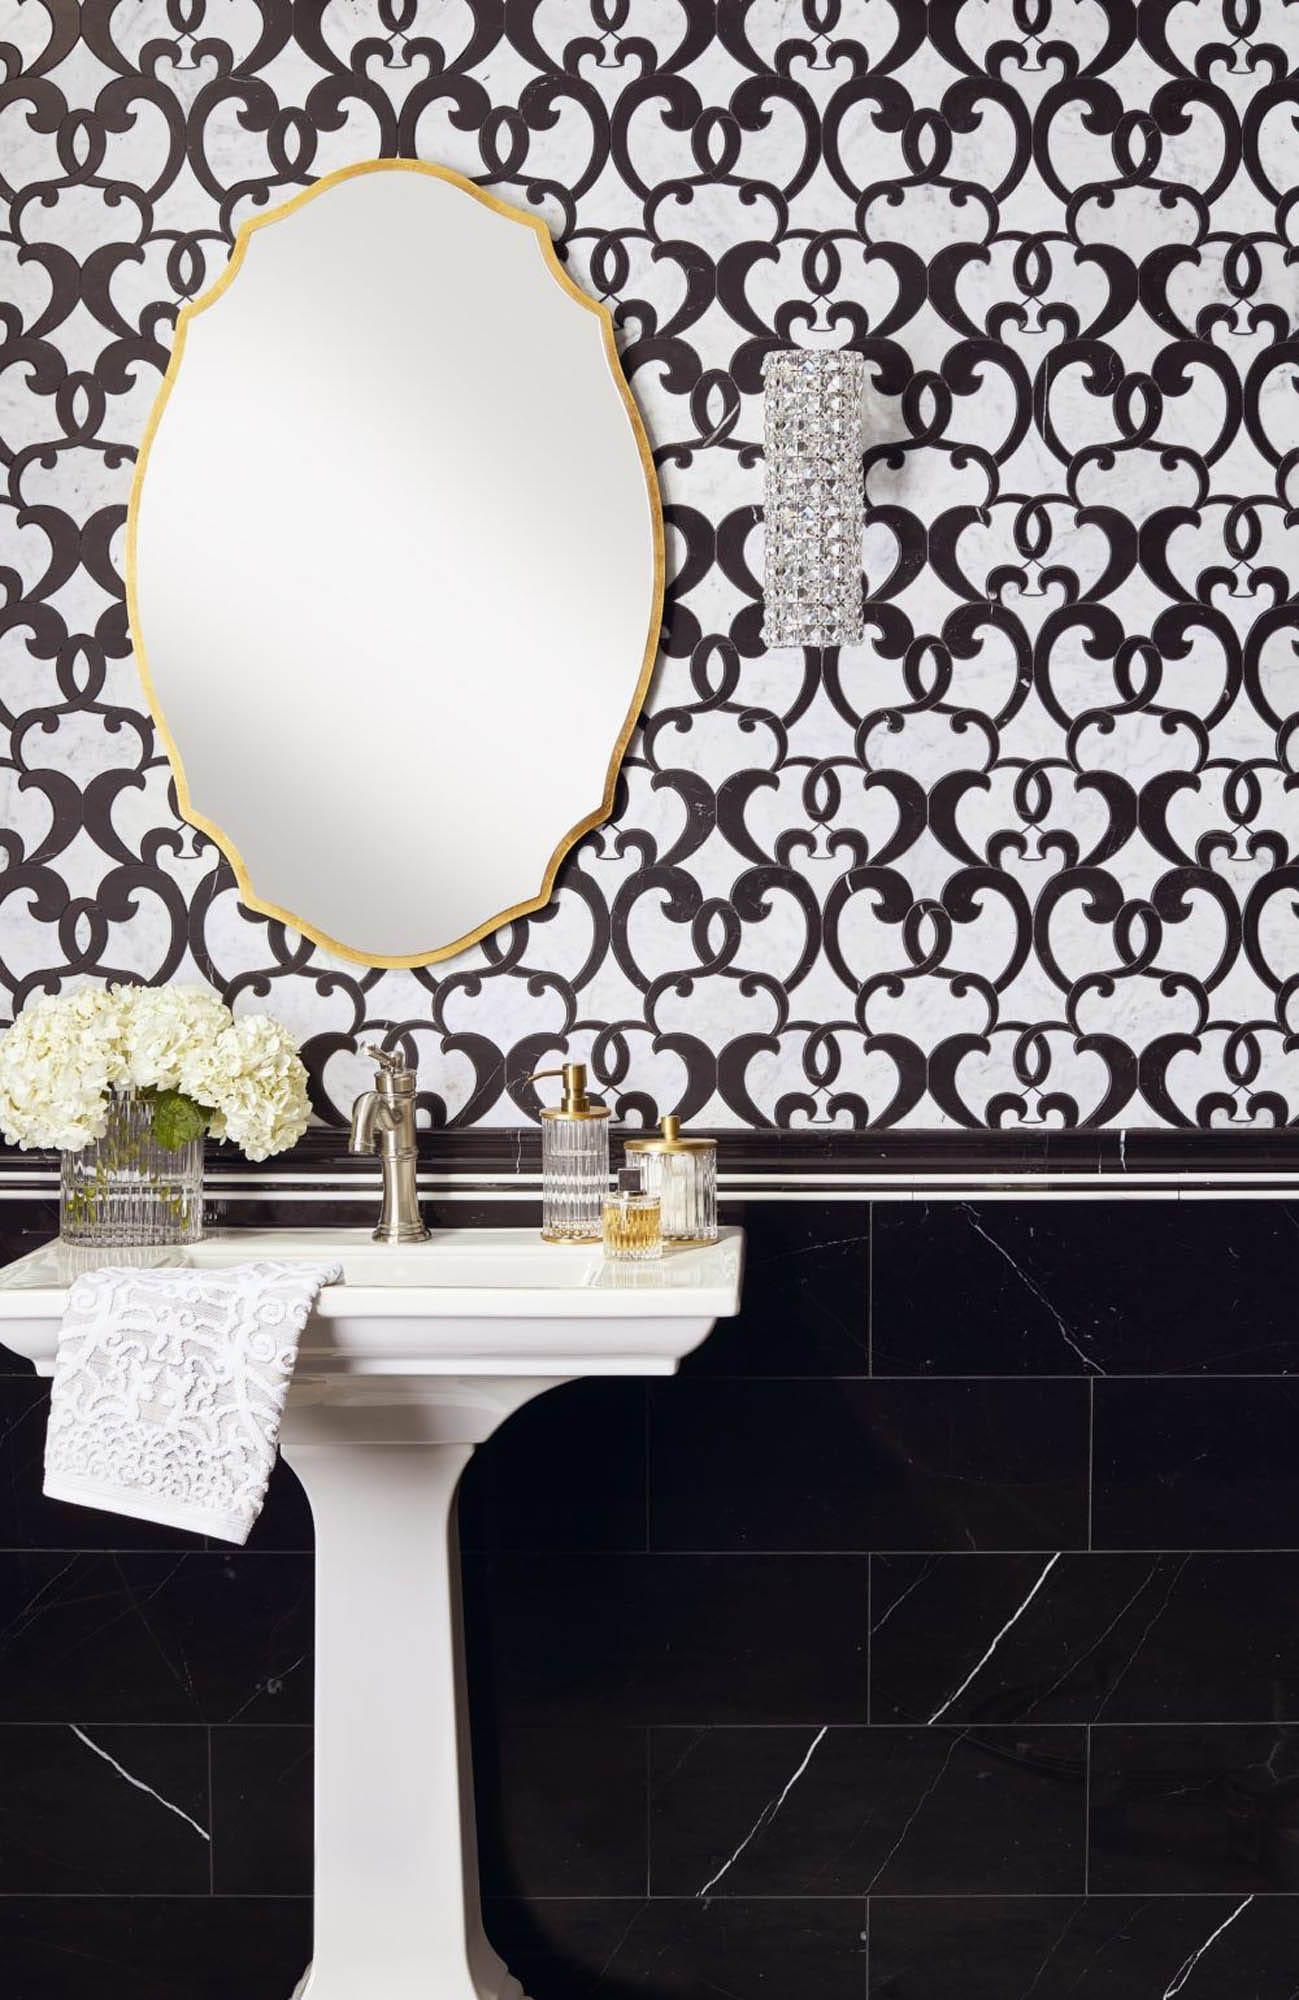 Black and white bathroom tile wallpaper effect